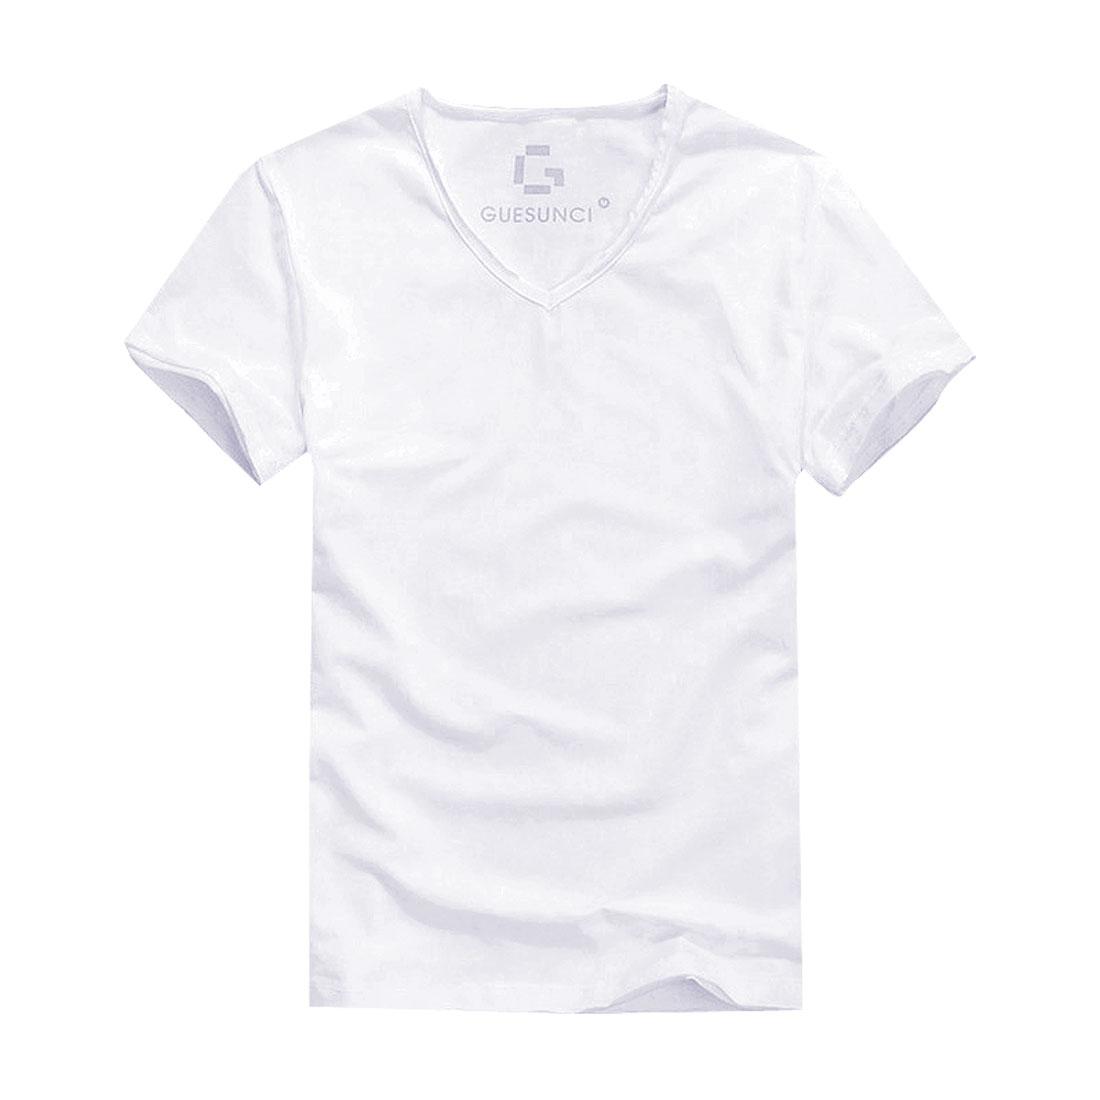 Man V Neck Destroyed Details Short Sleeve Fashional Shirt White M